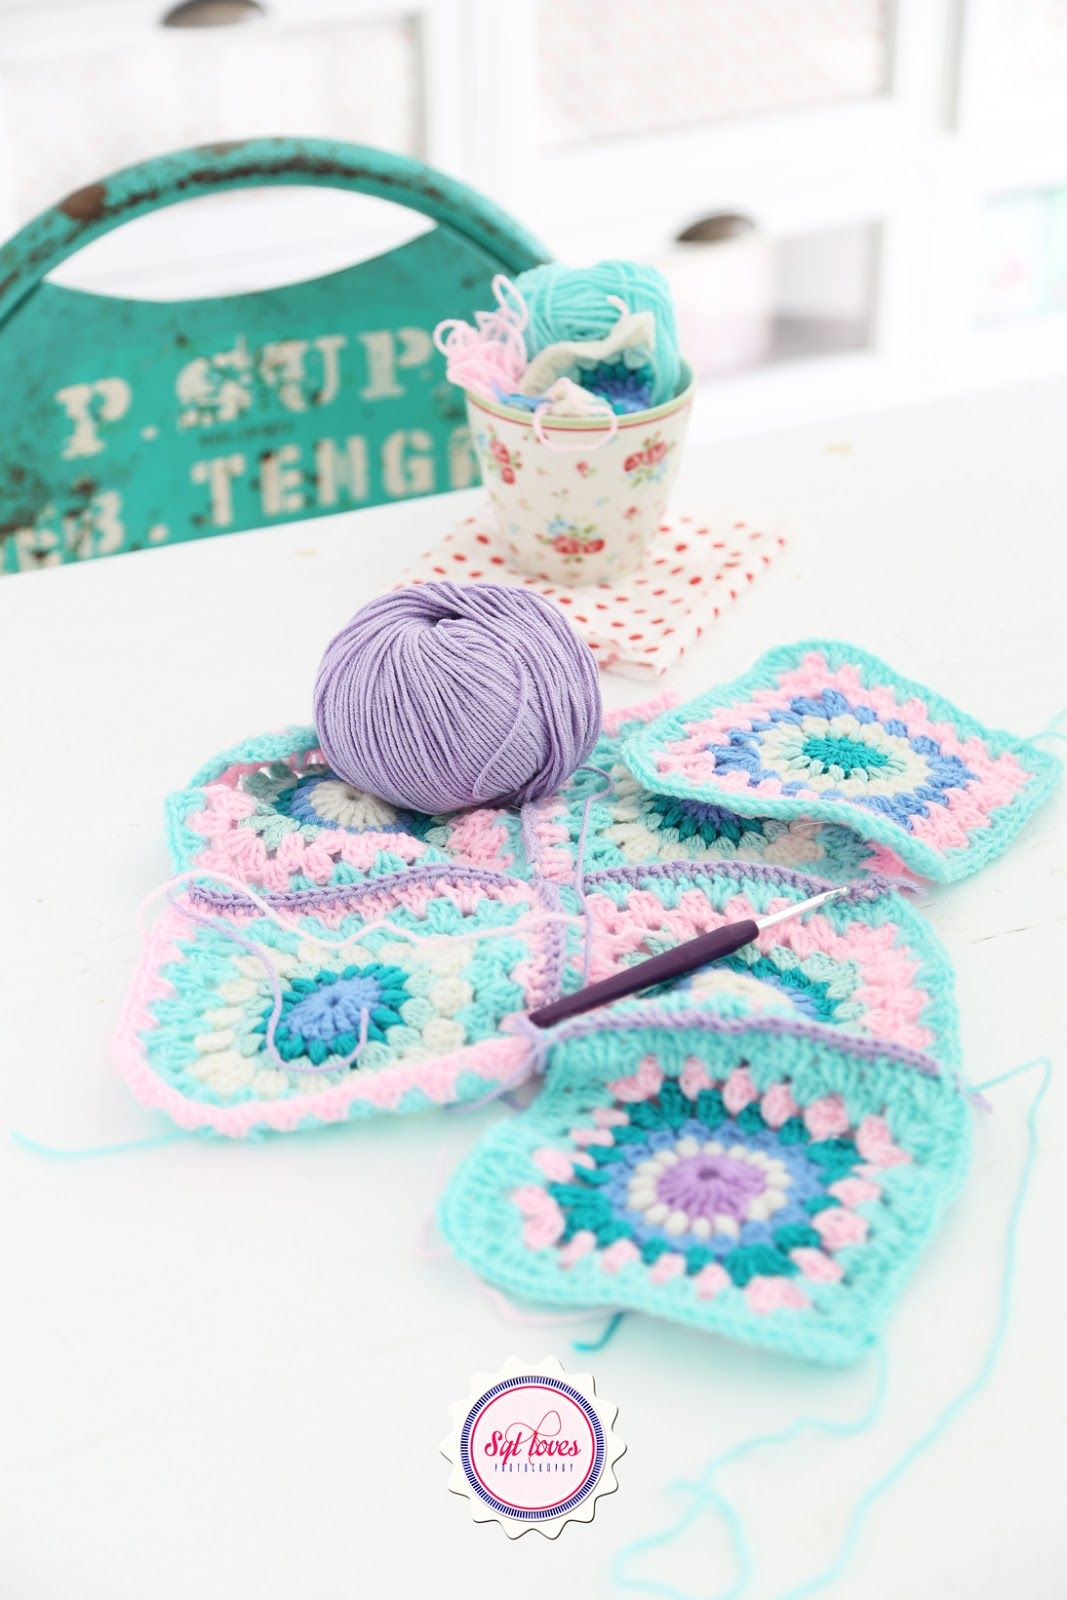 Pretty pastel crochet inspiration @ Sylloves...